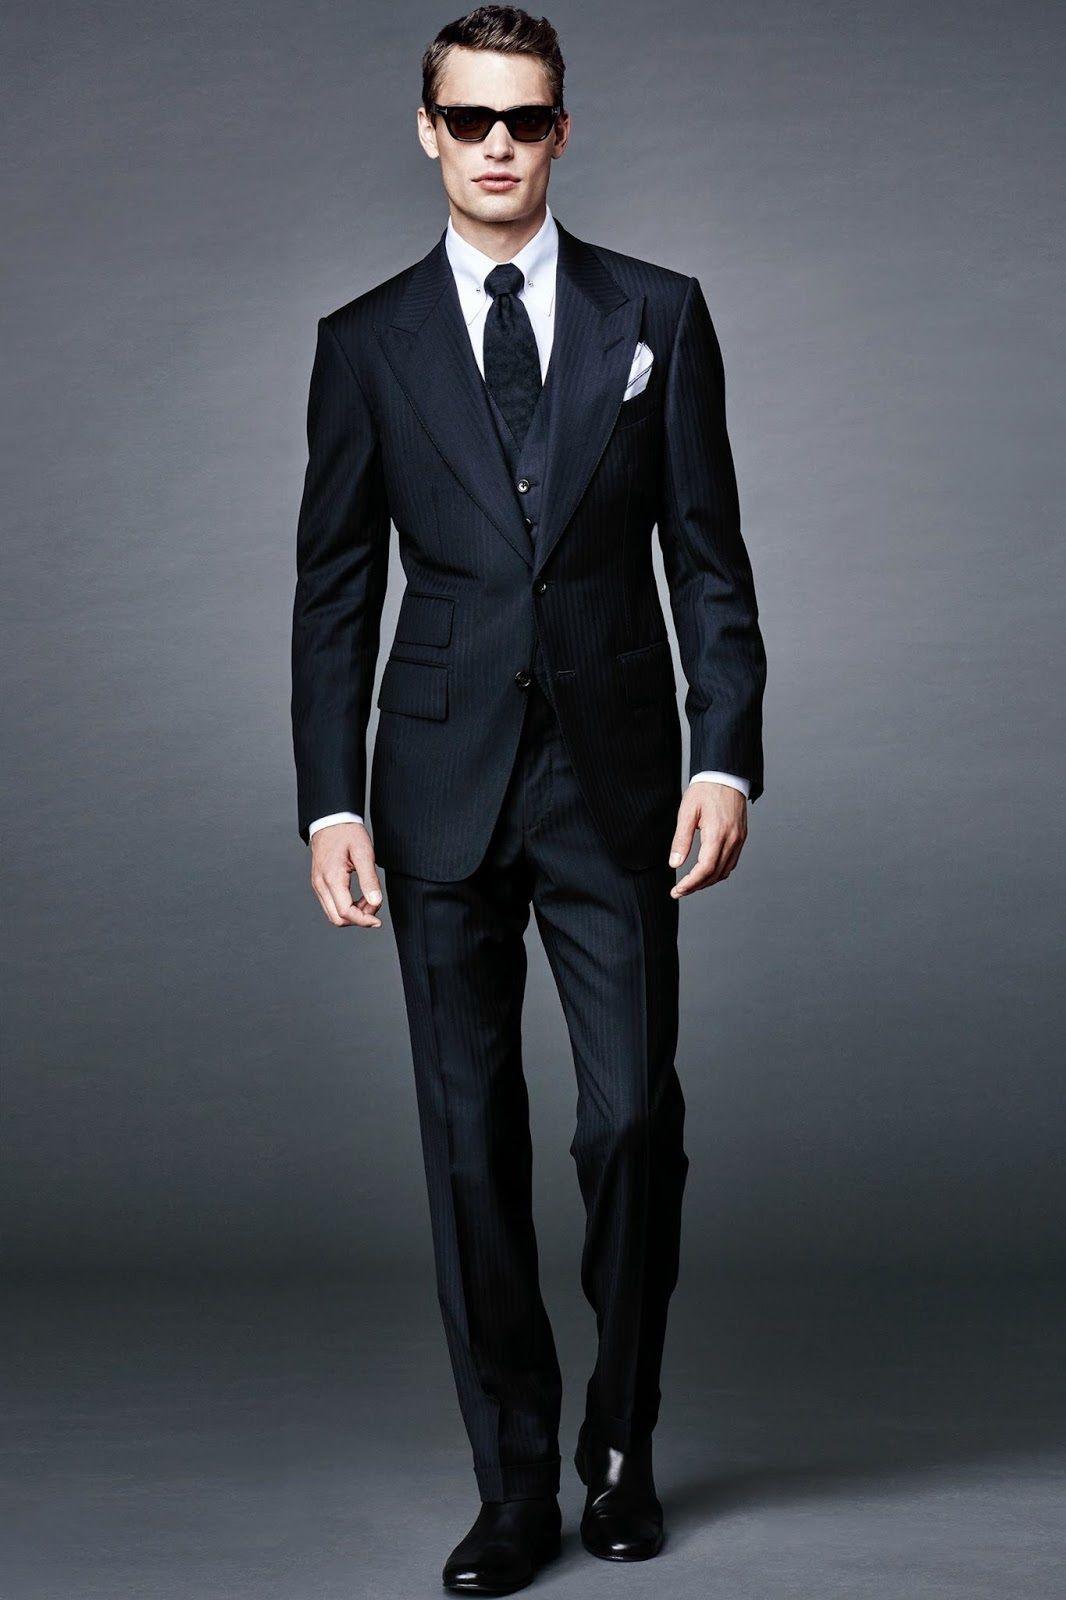 Black dress navy suit - Men S Navy Vertical Striped Three Piece Suit White Dress Shirt Black Leather Chelsea Boots Black Tie